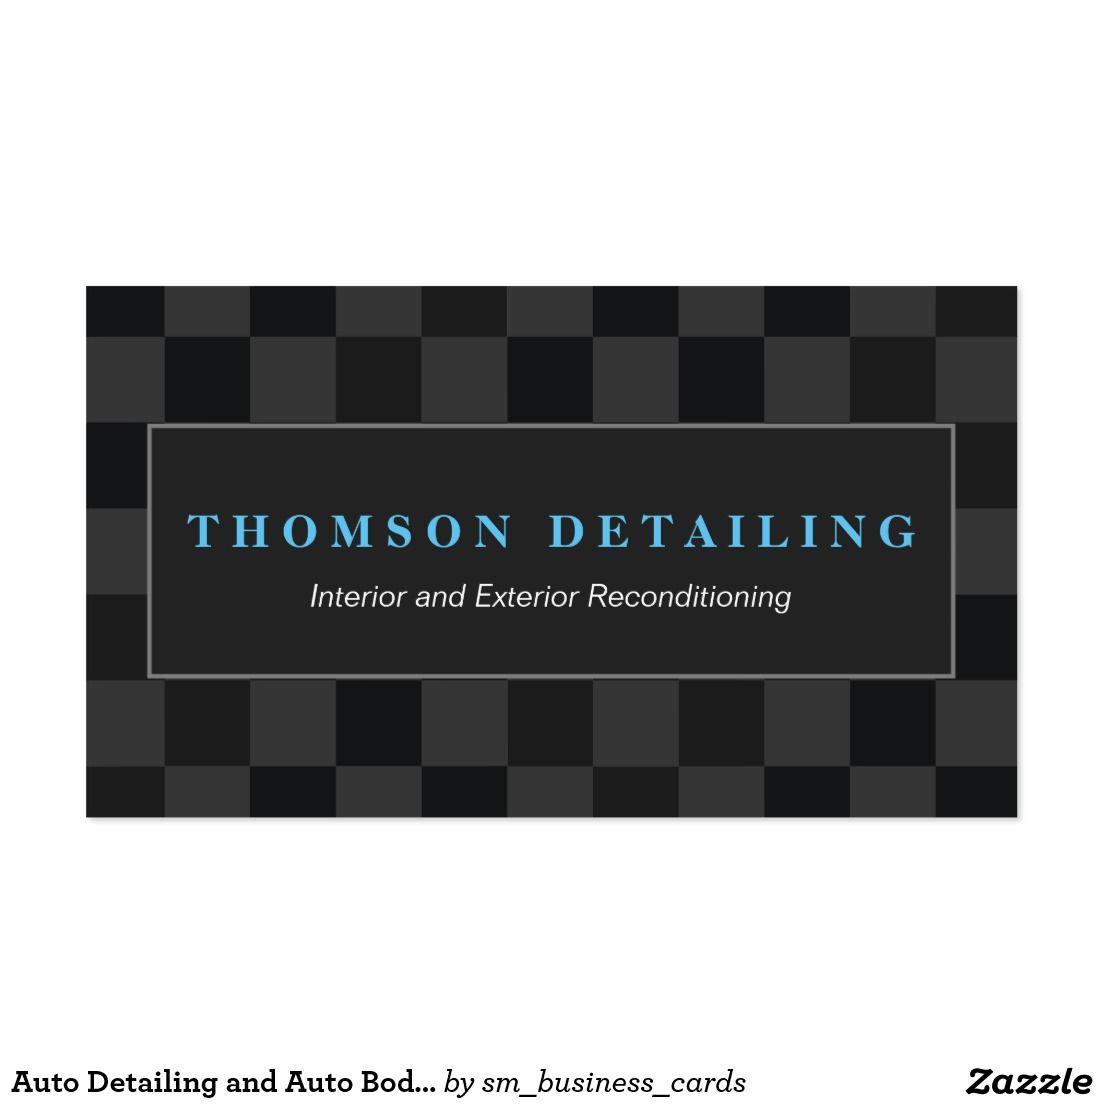 Retro Auto Detailing & Auto Body Repair Checkered Business Card ...